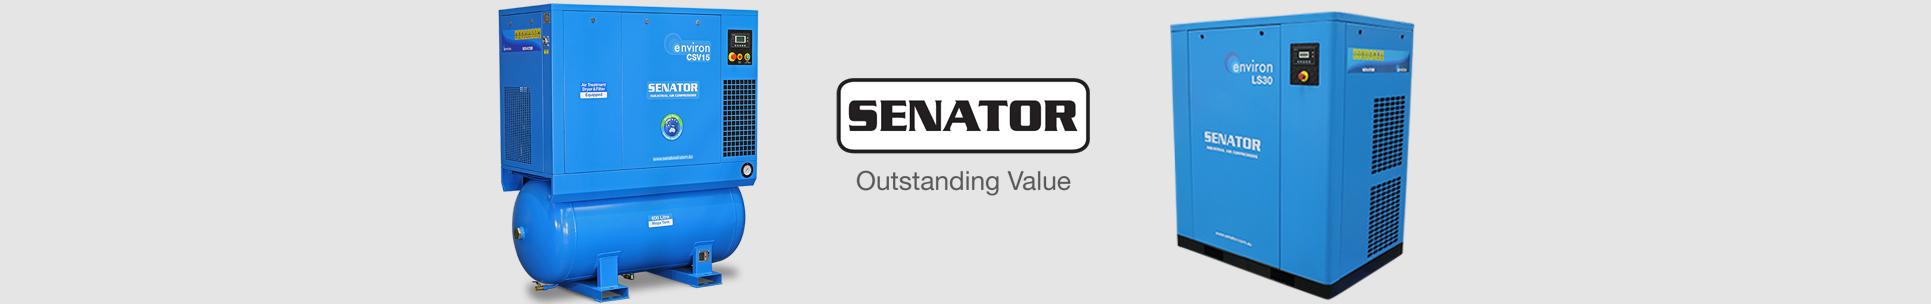 Glenco Home Page – Banner Image – Senator